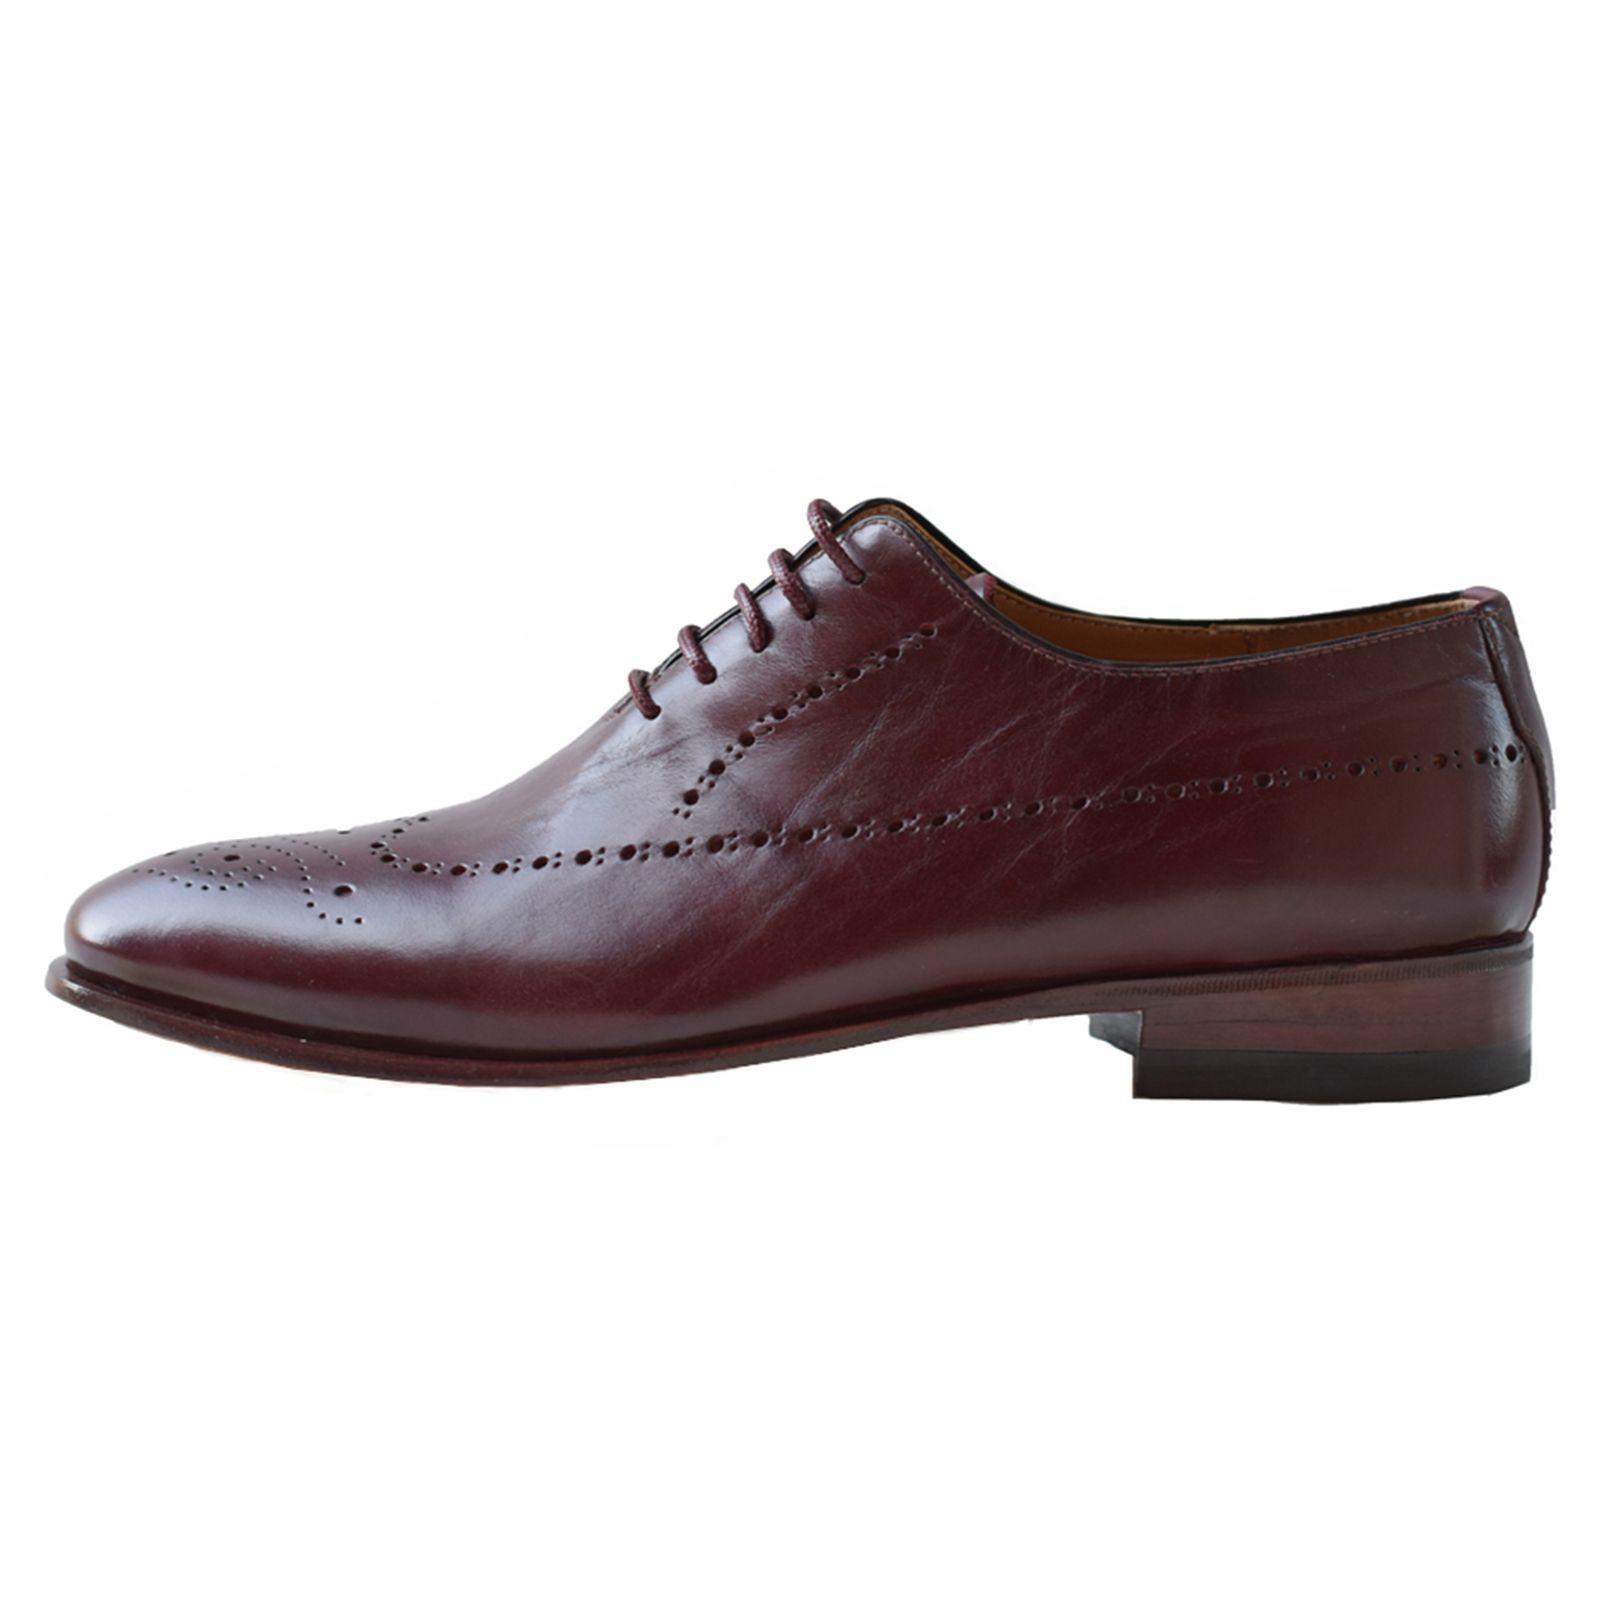 کفش مردانه دگرمان مدل غوغا کد wh.c.wing.02 -  - 2